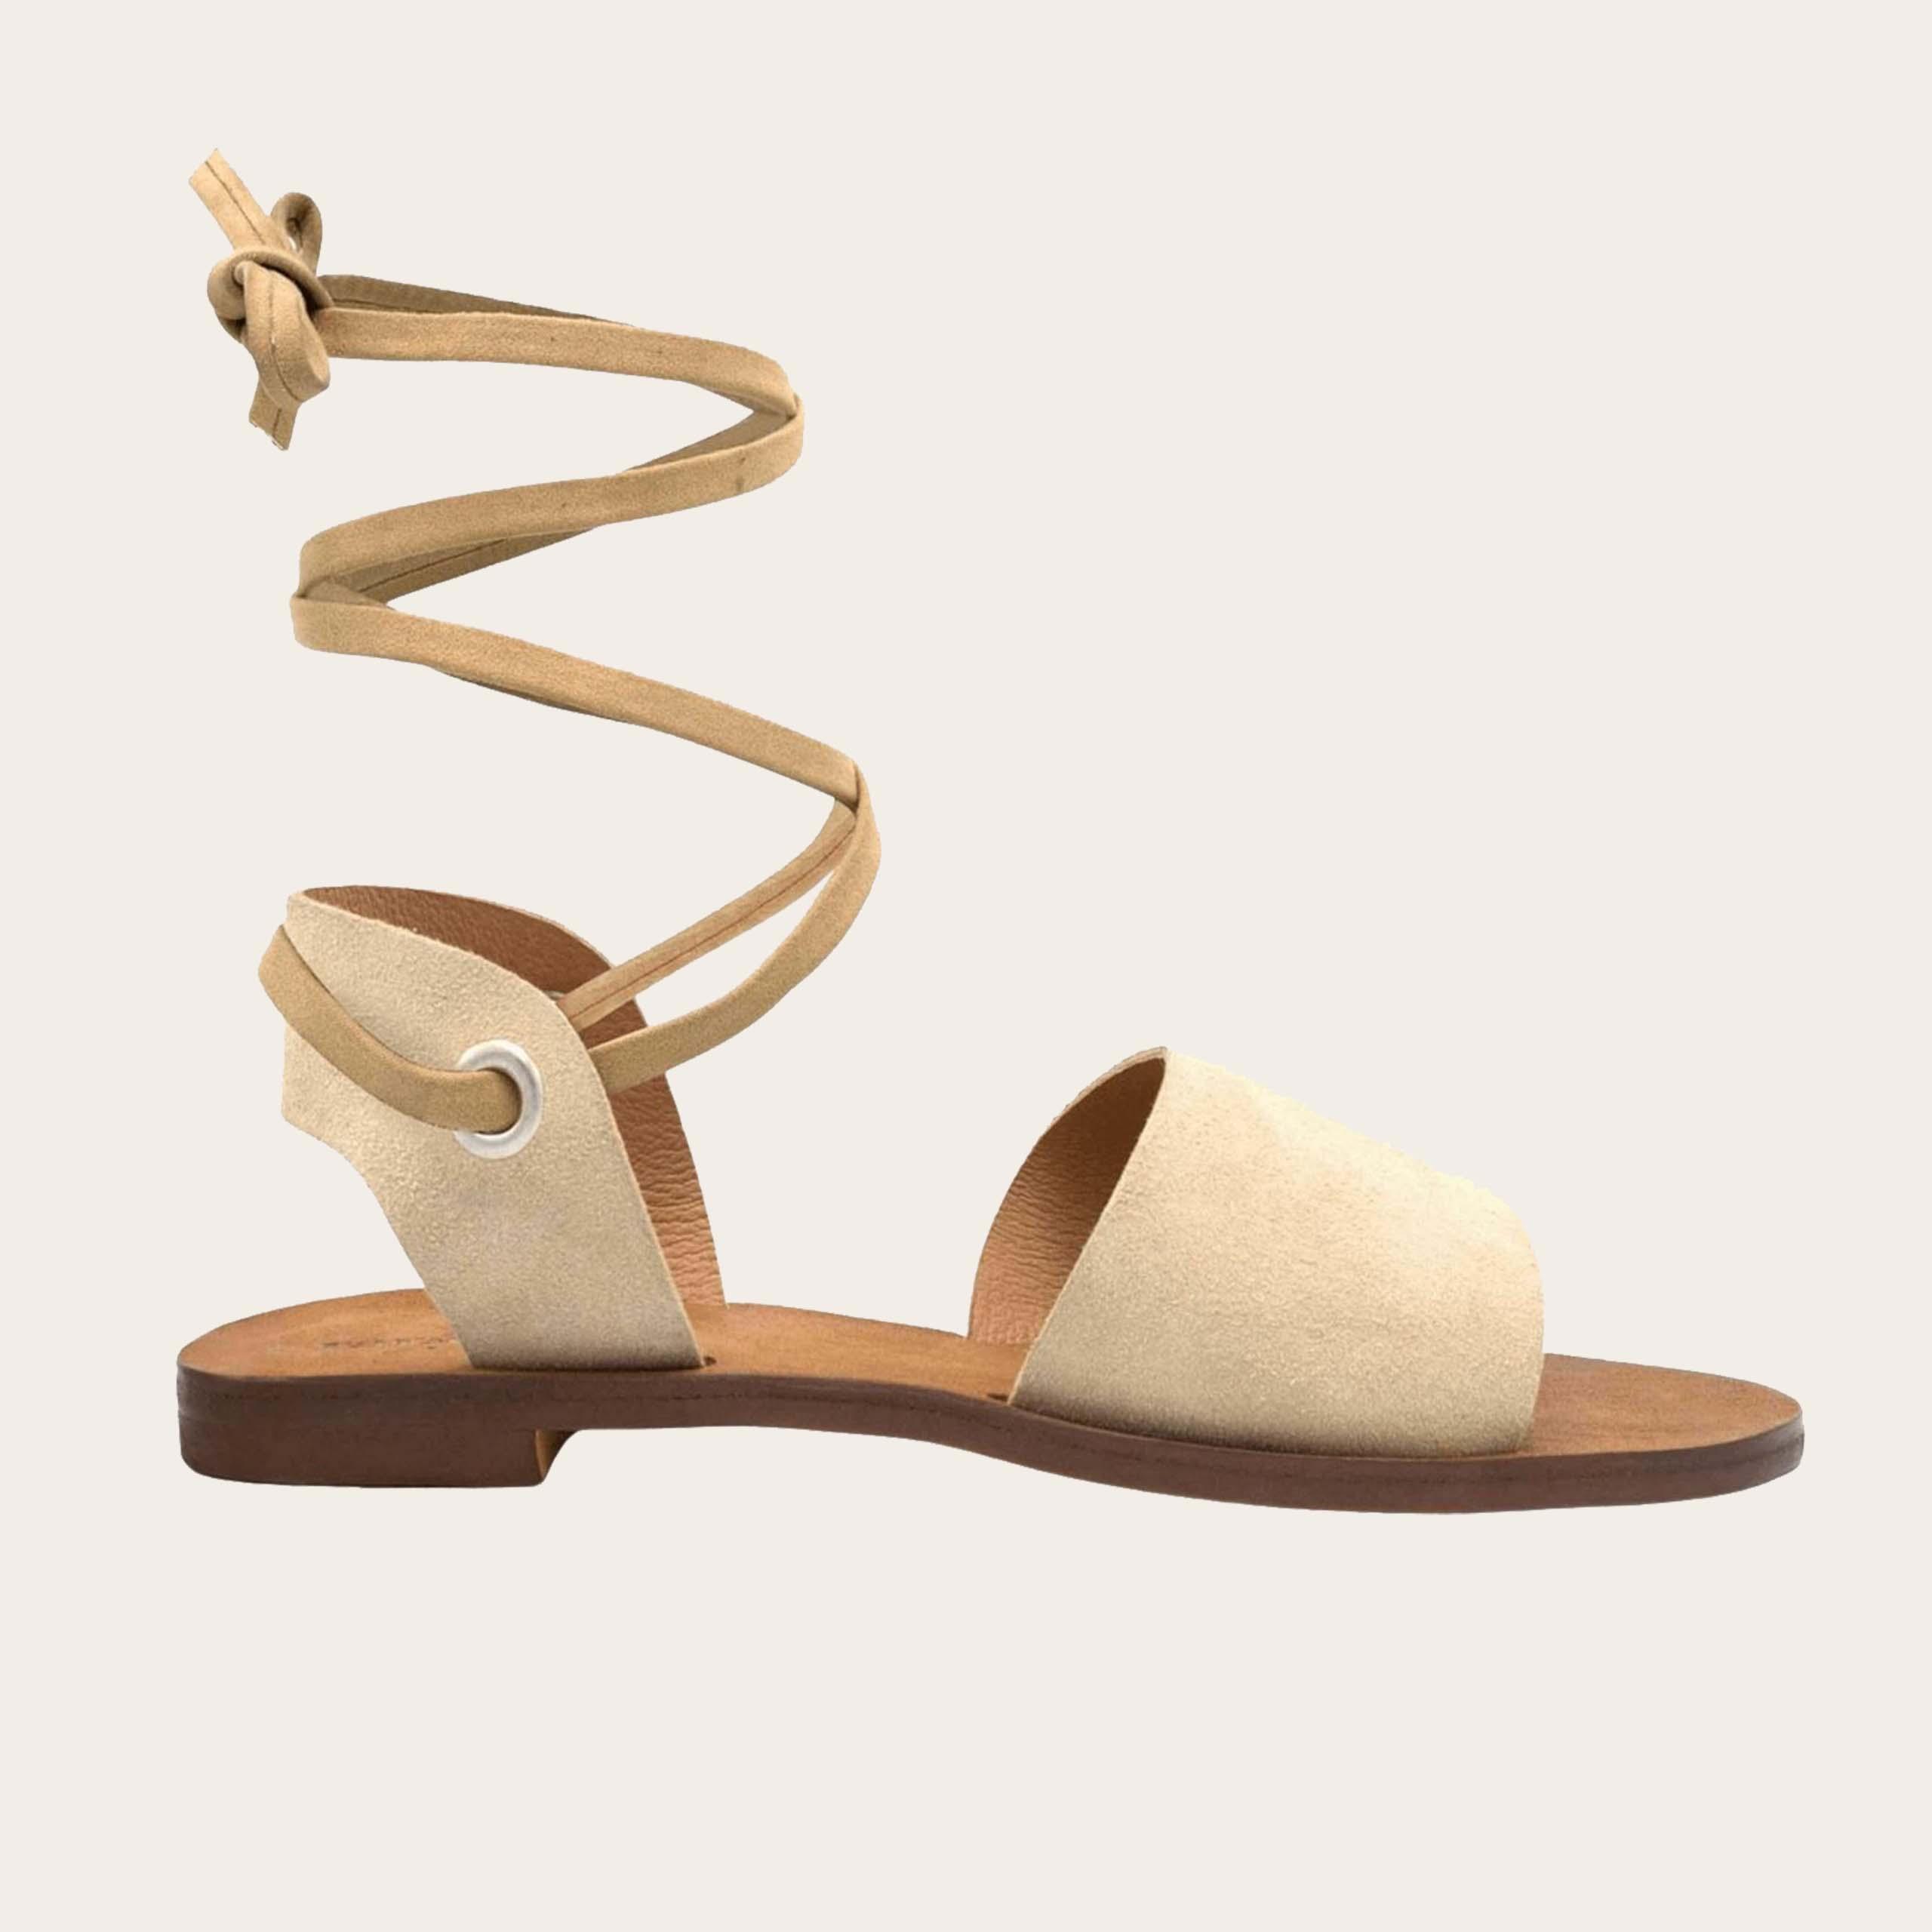 acapulco-beige_1_lintsandalen sandals travelsandals vegan sustainable sandals wikkelsandalen